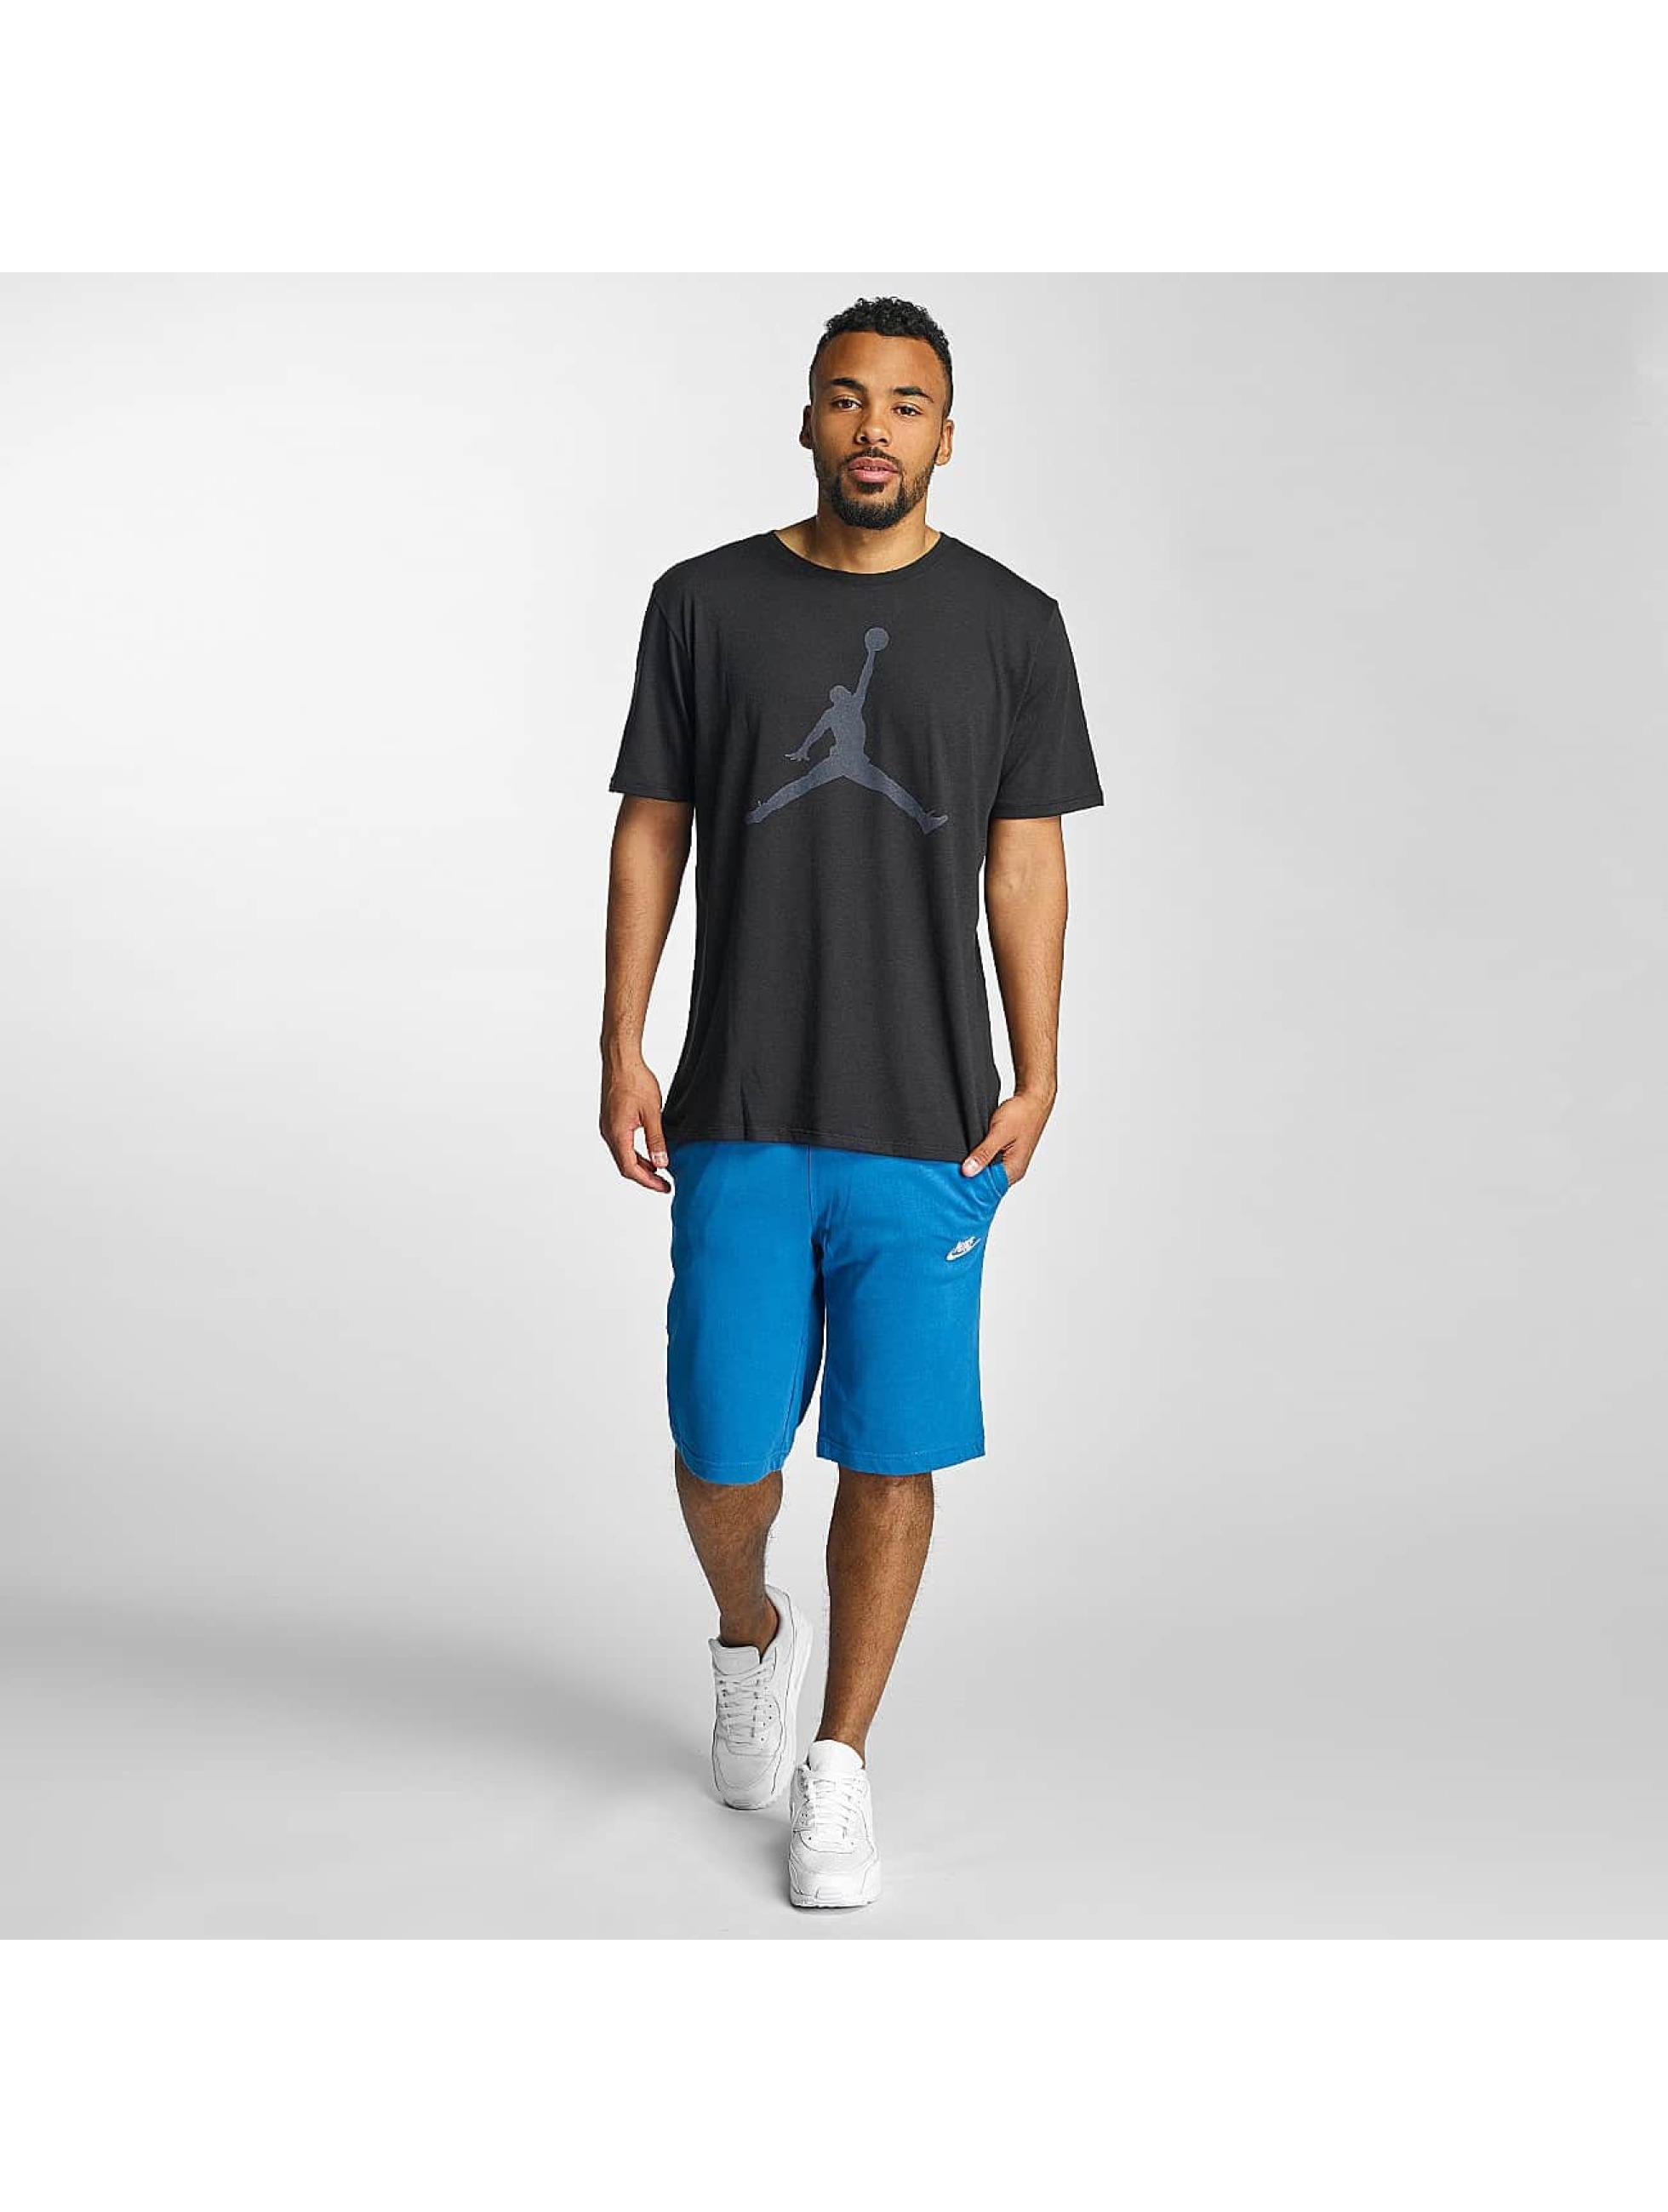 Jordan T-Shirt The Iconic Jumpman black